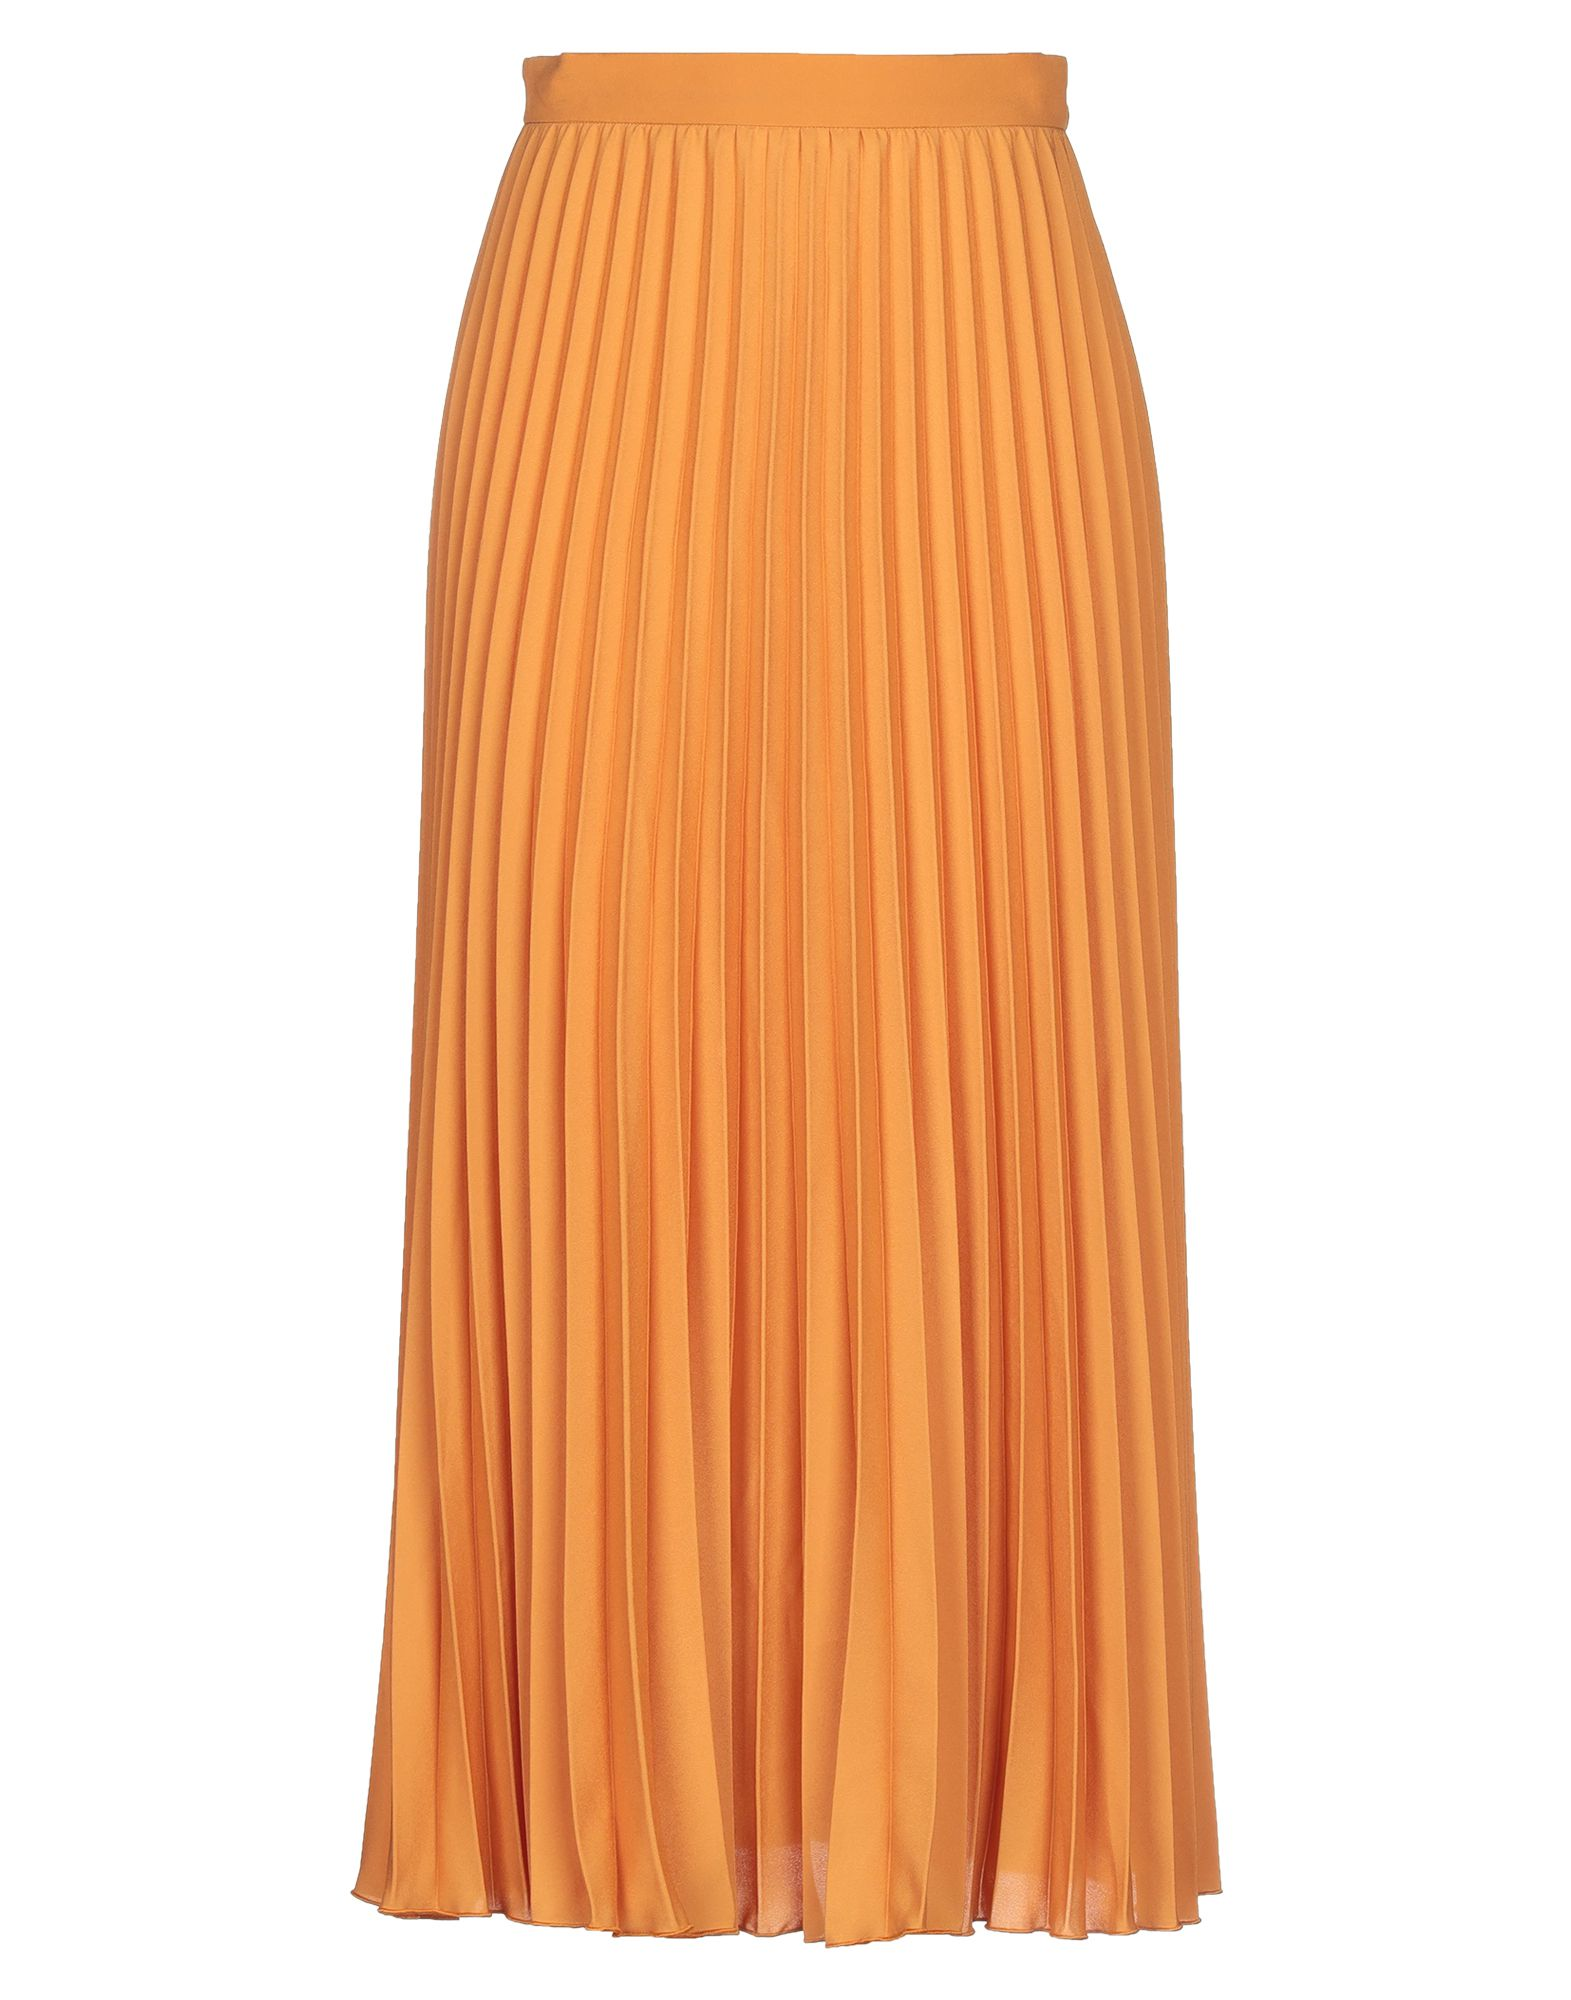 WEEKEND MAX MARA Юбка длиной 3/4 юбка карандаш с потайной молнией max mara studio